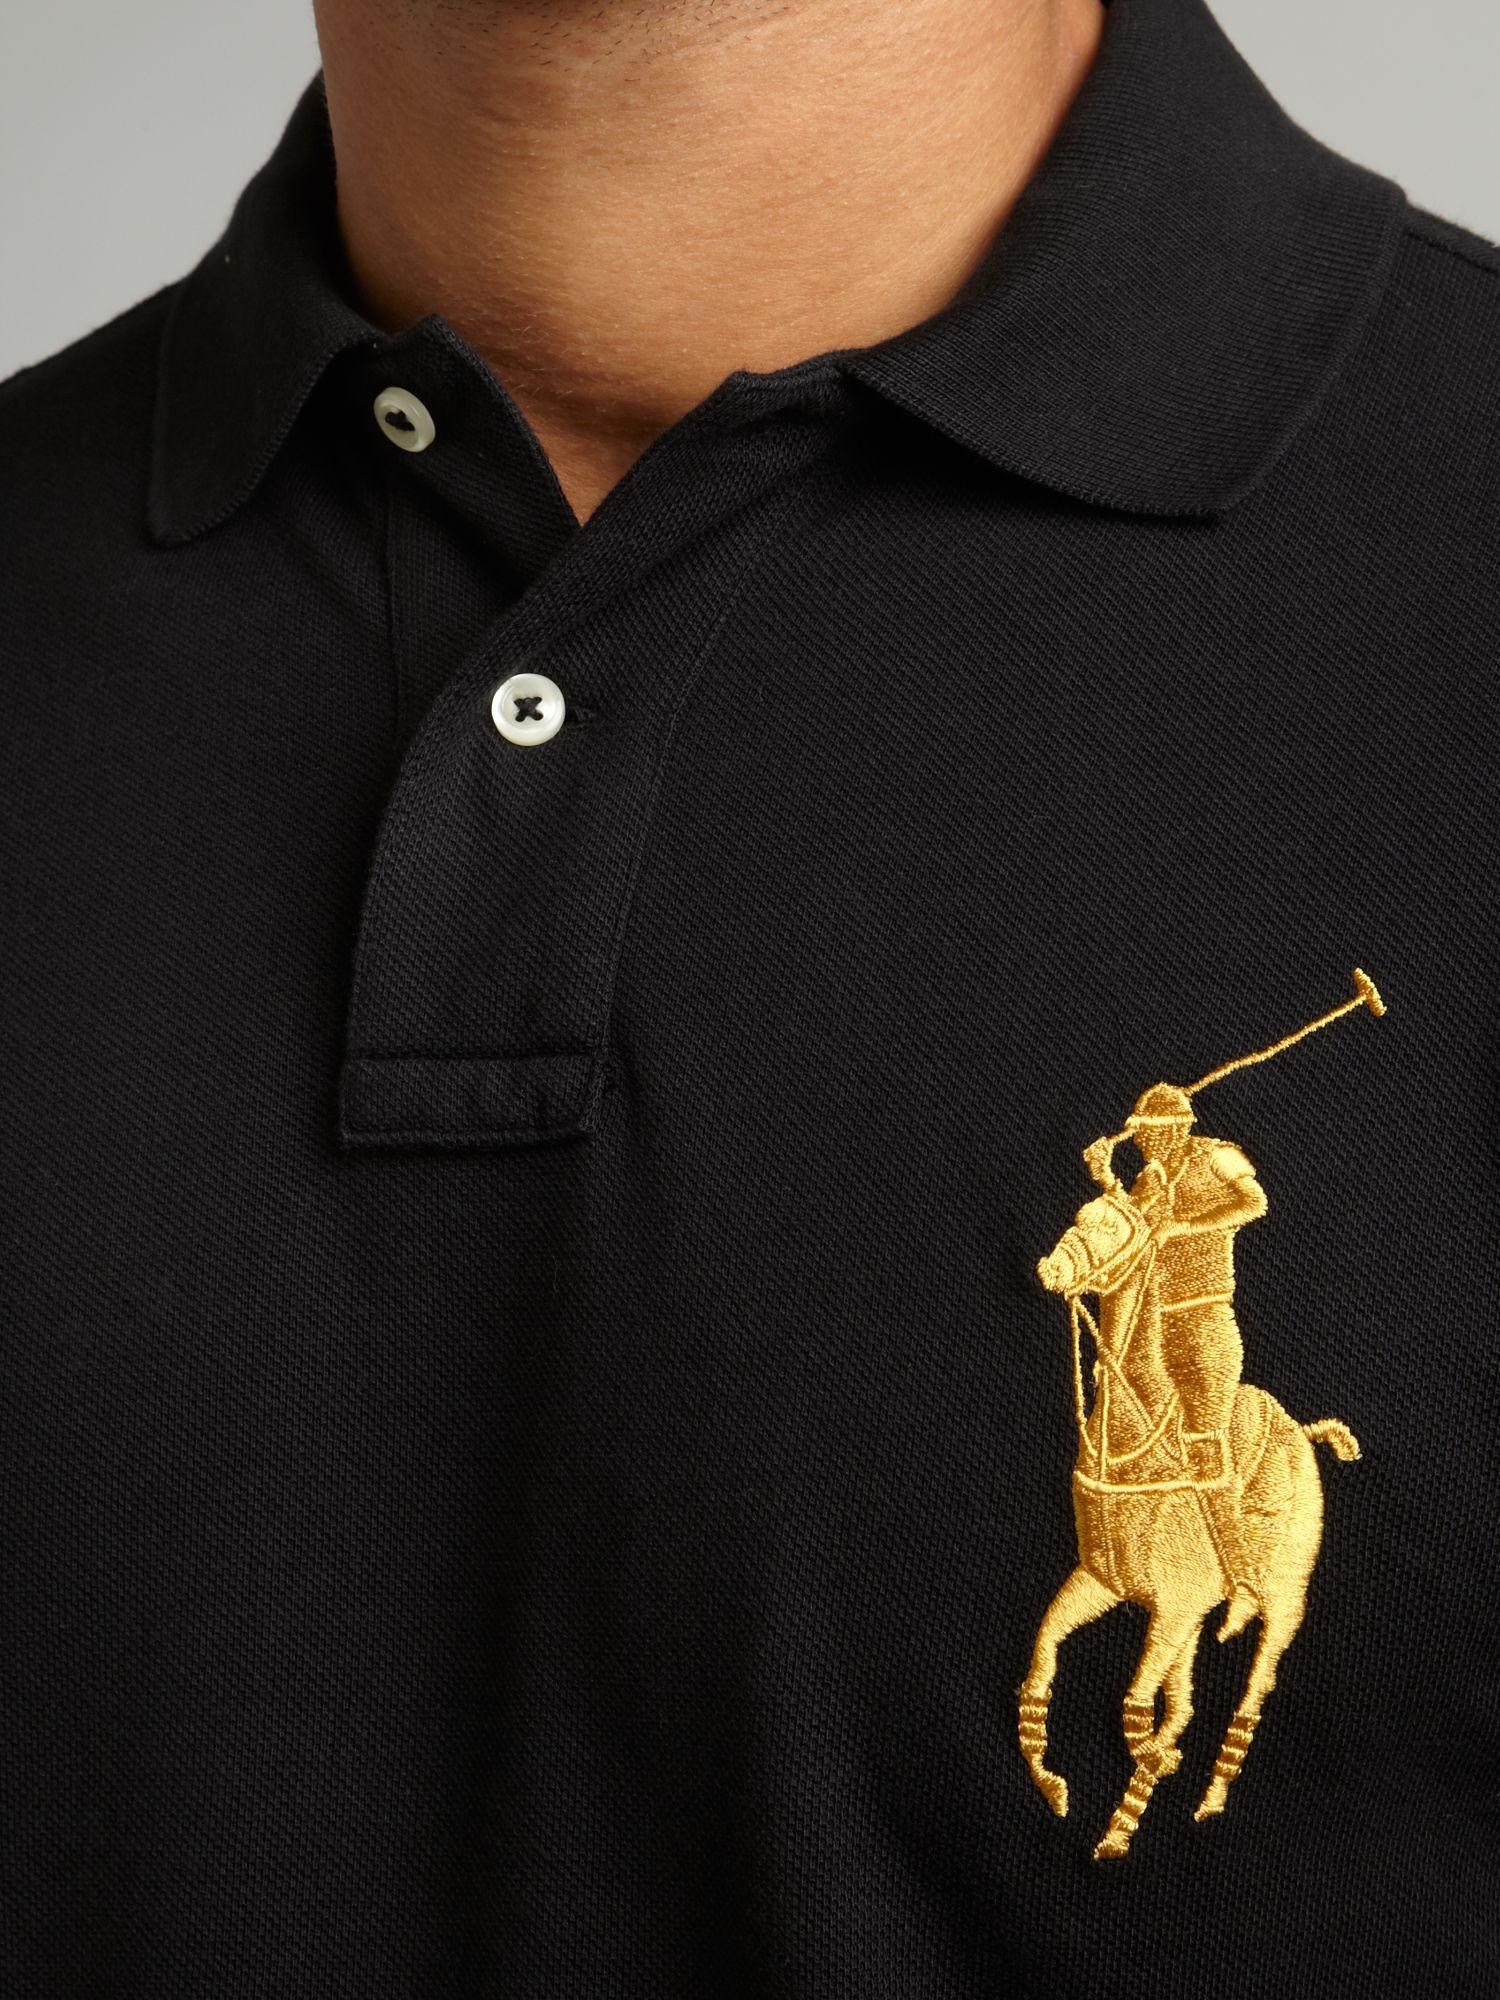 Ralph Lauren Green White Big Pony Polo Men